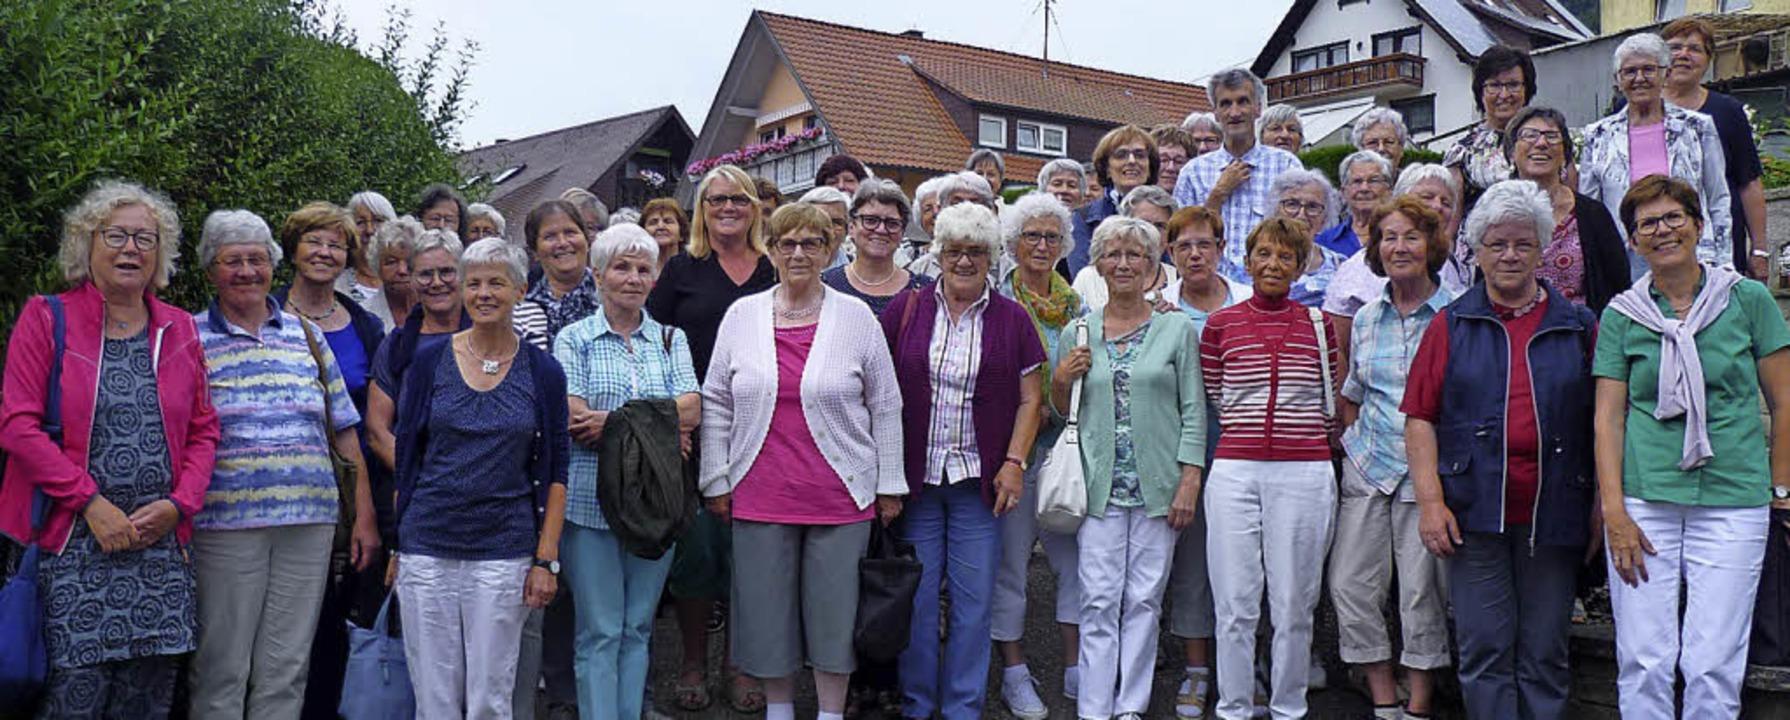 52 Frauen der Frauengemeinschaft Mahlb...uf den Weg in den Schwarzwald gemacht.    Foto: KFD Mahlberg